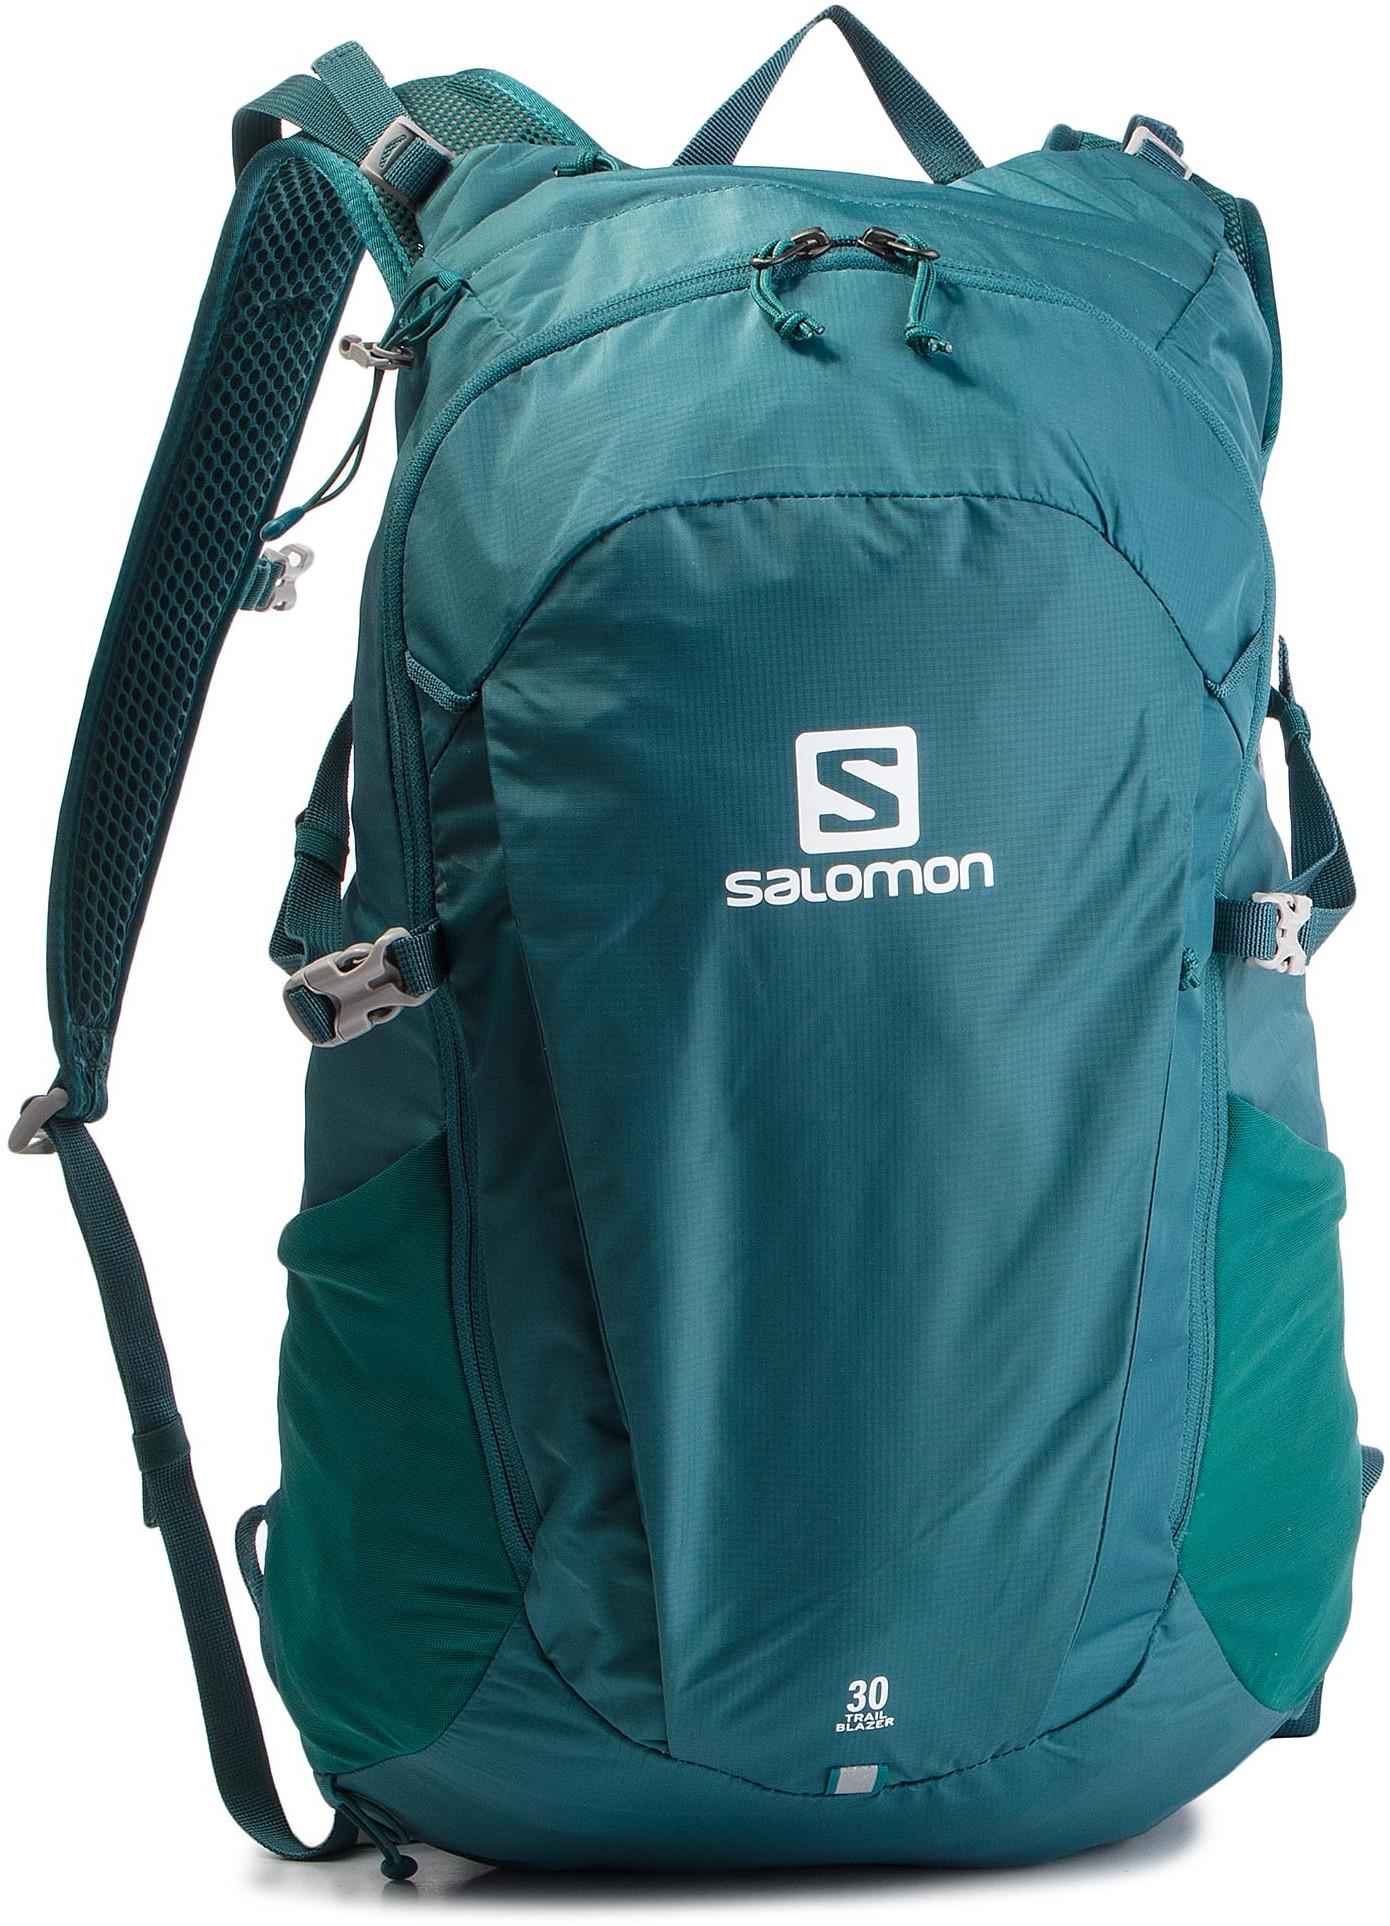 c668be0f5a8c8 Salomon Plecak Trailblazer 30 C10843 01 V0 Mediterranea